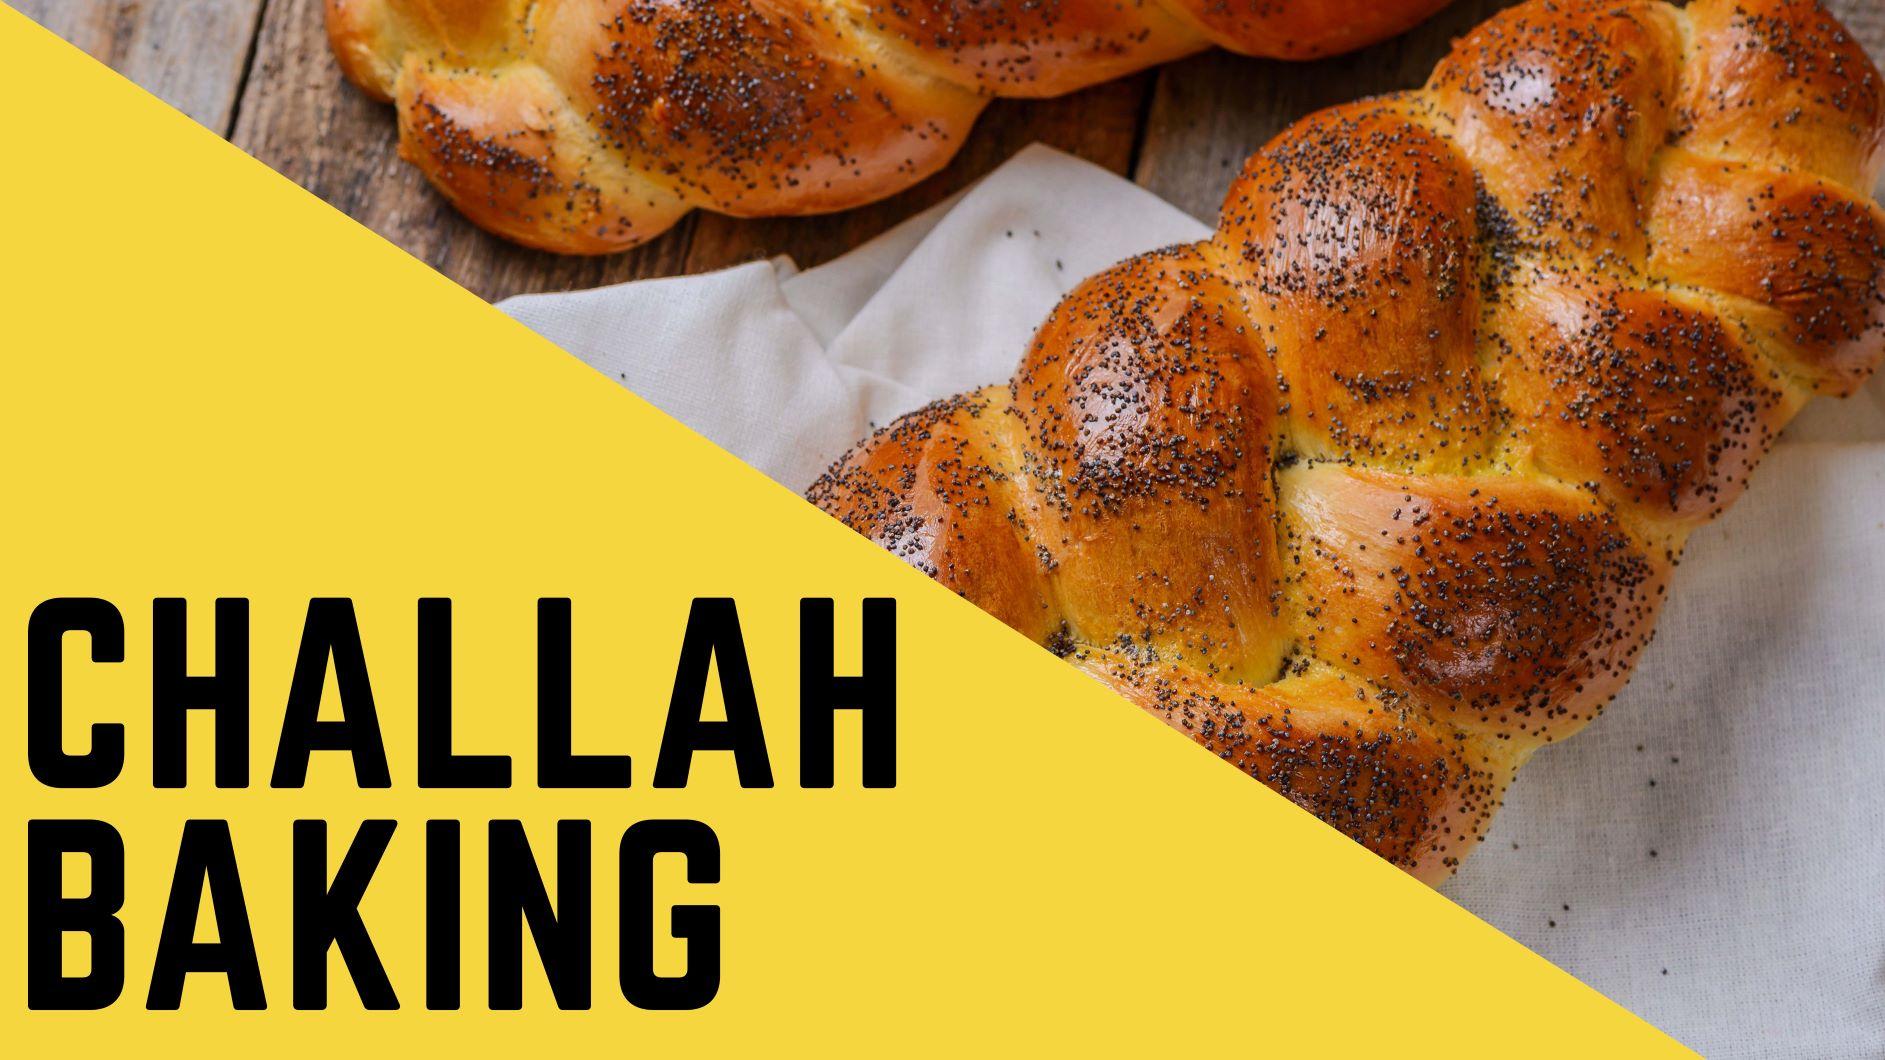 Challah Baking - Zoom